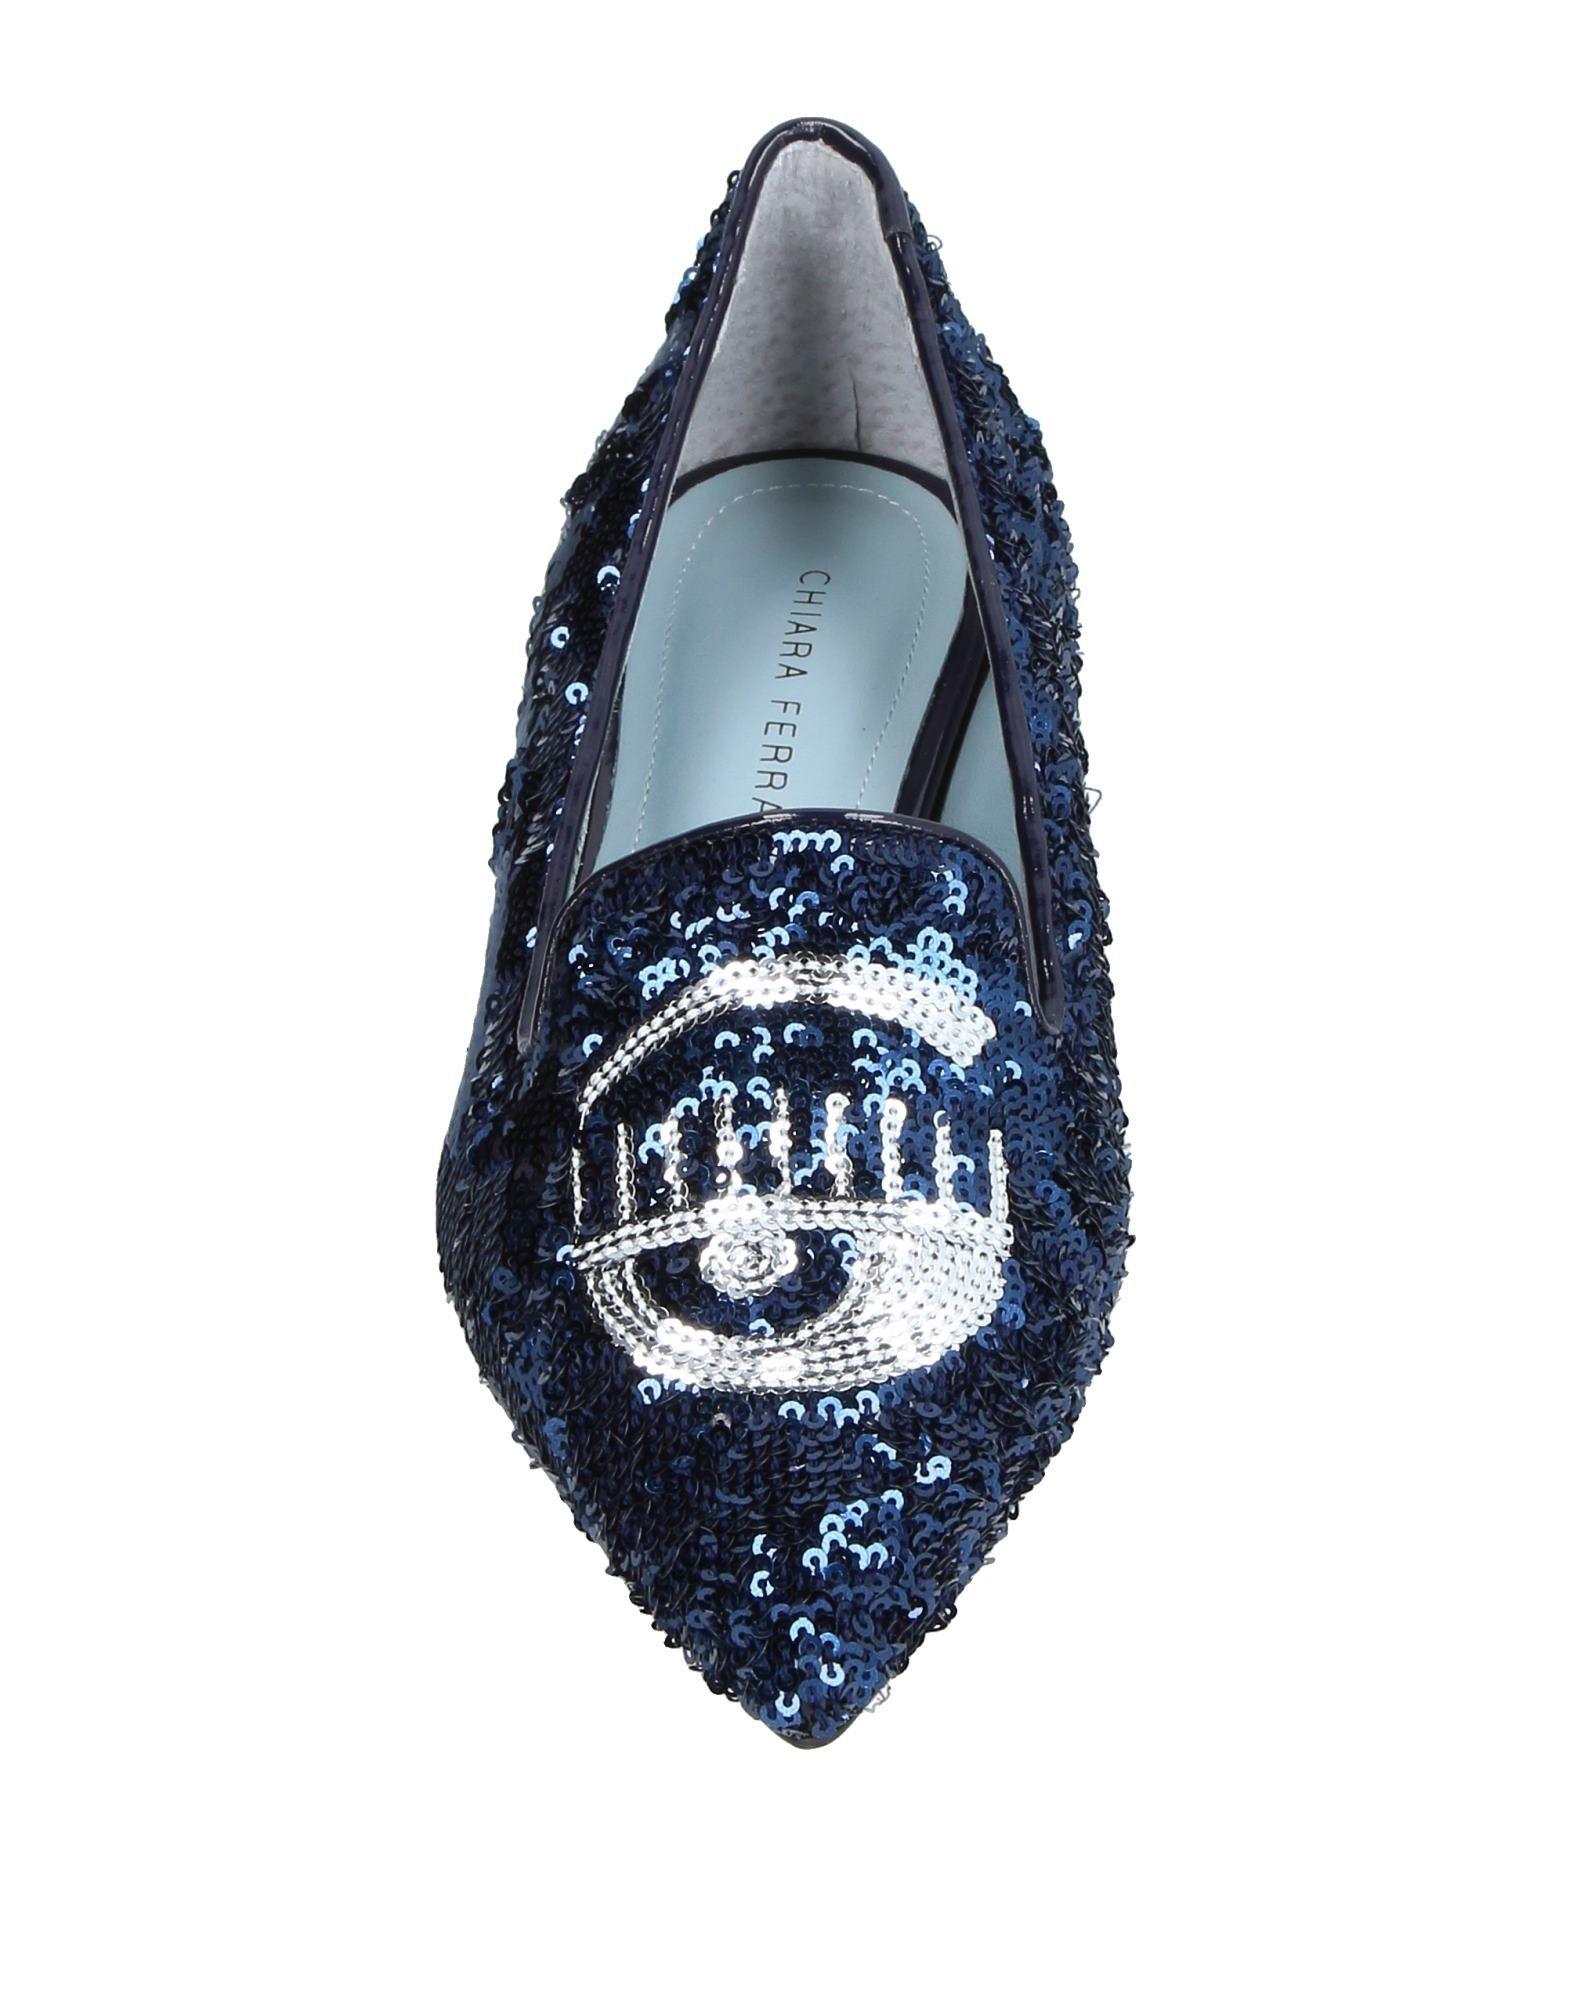 Chiara Ferragni Mokassins Damen  11227903LUGut aussehende strapazierfähige Schuhe